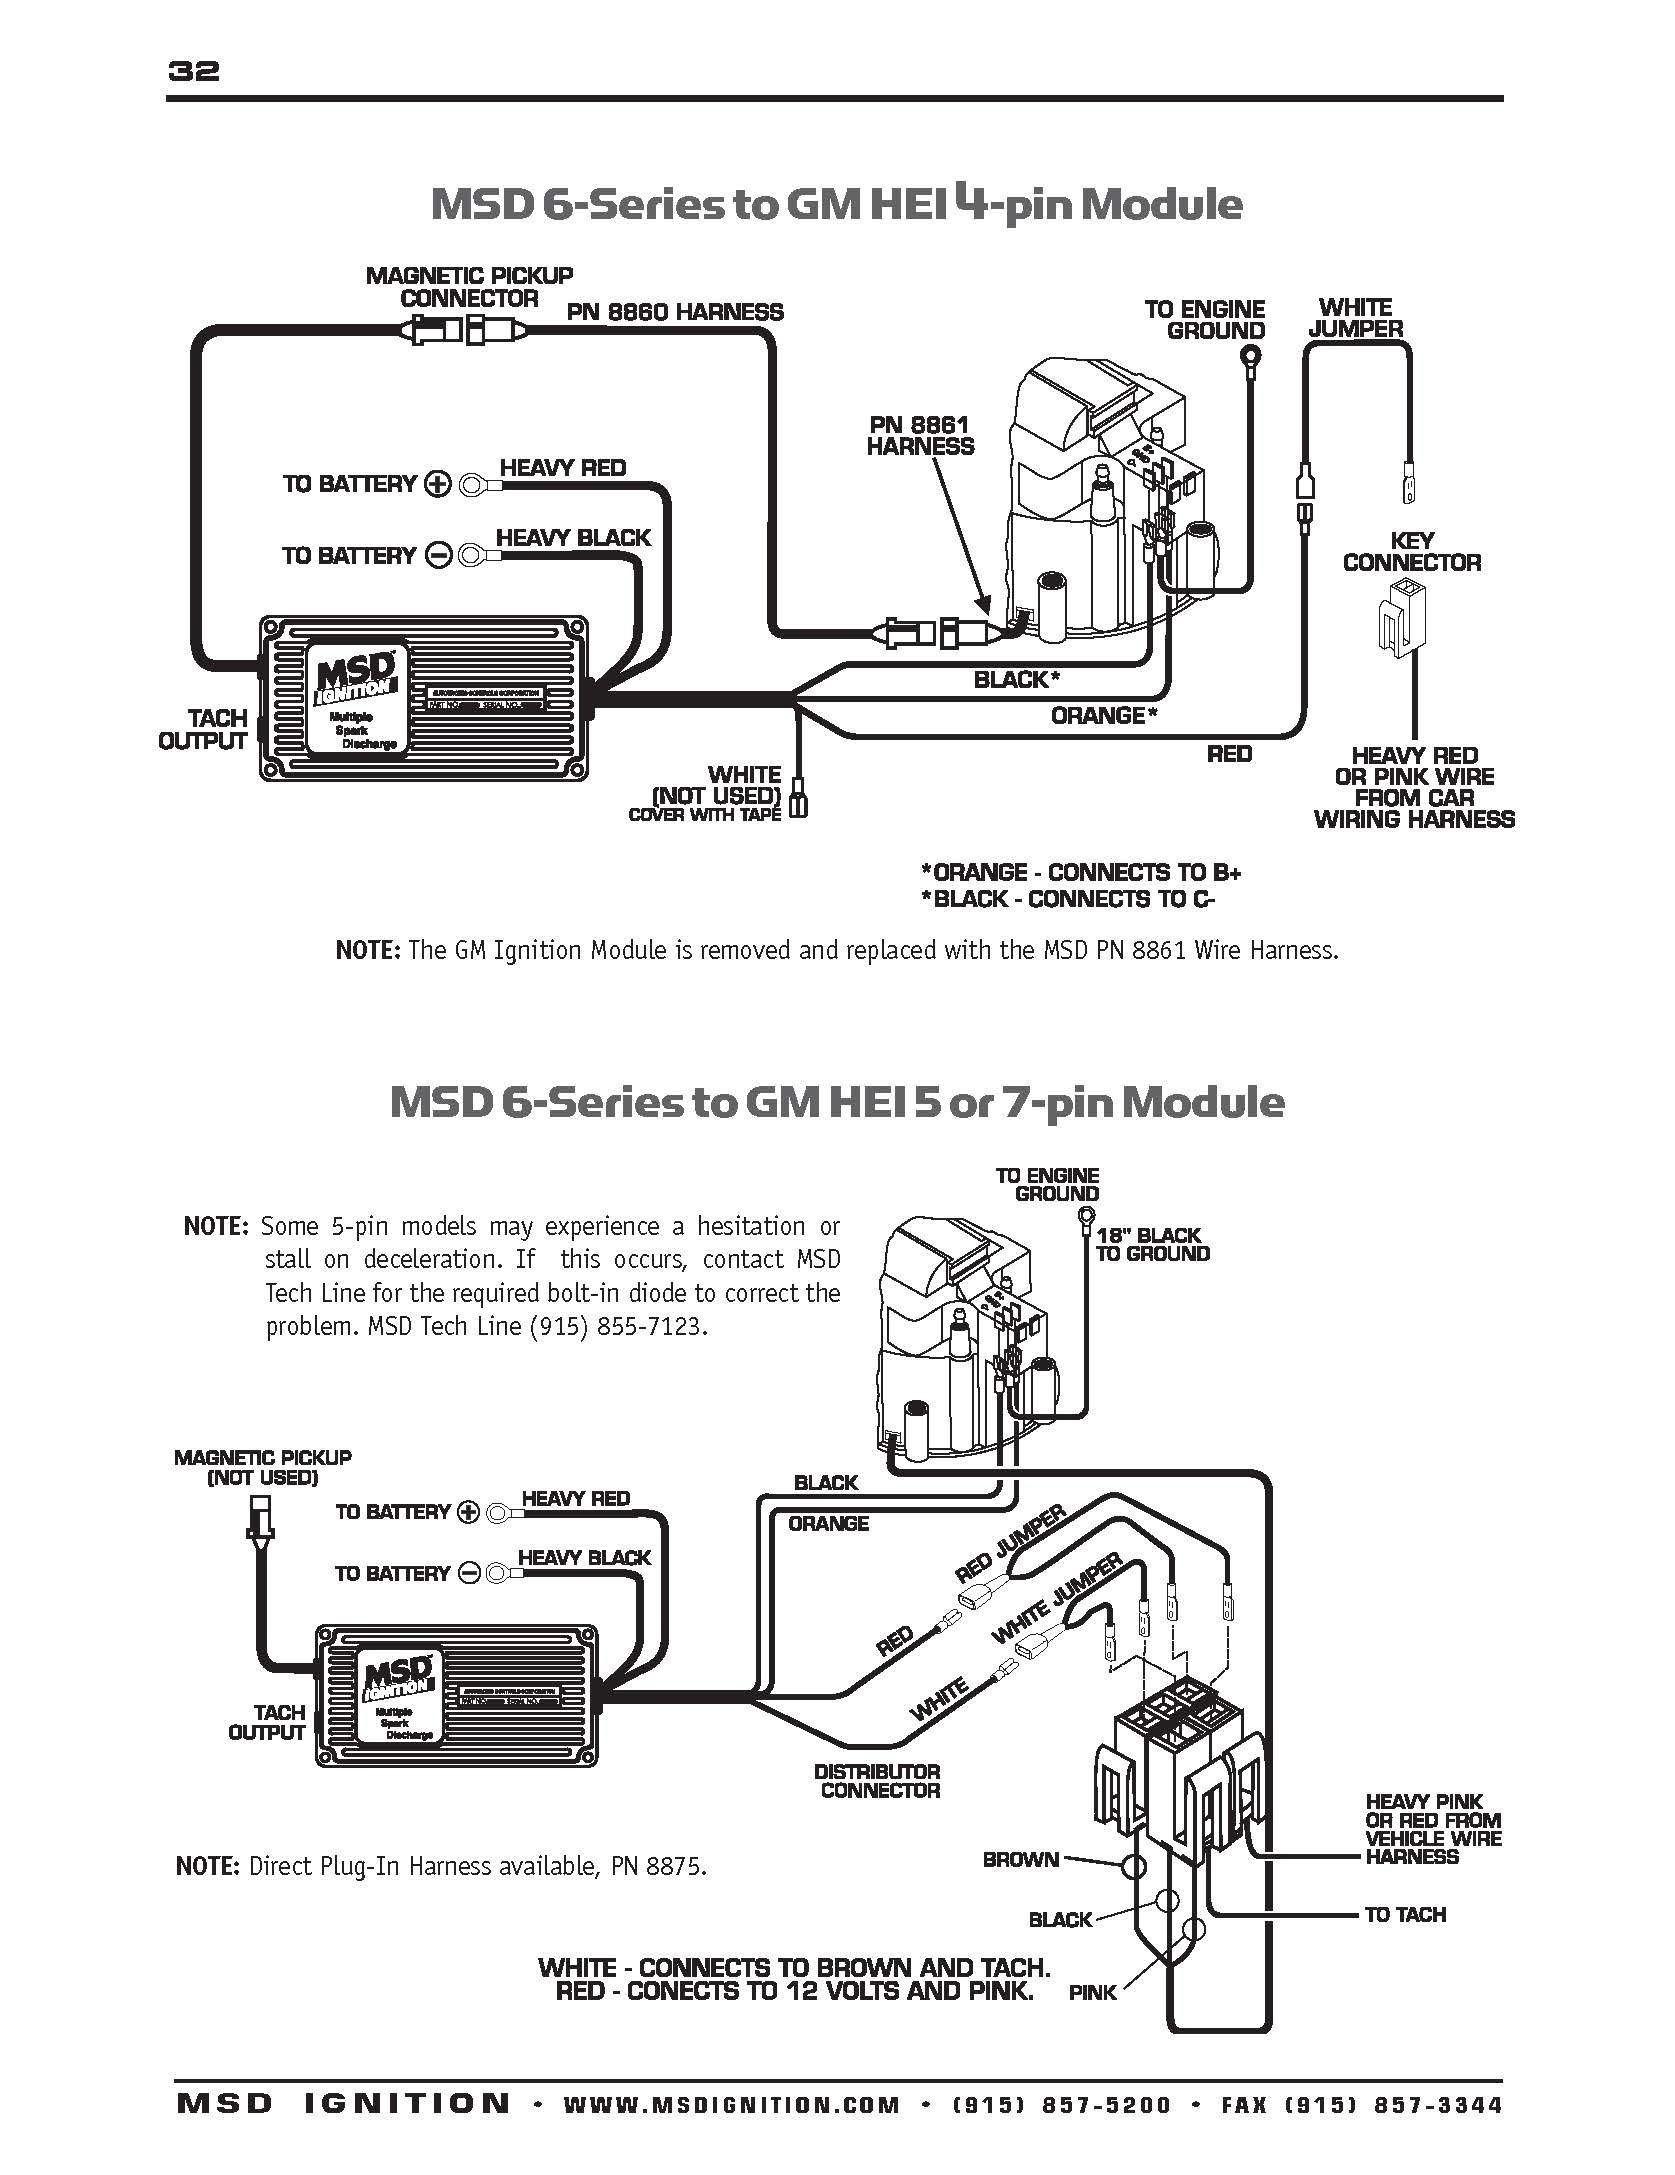 sunpro super tach 3 wiring diagram msd tach adapter wiring diagram wire center u2022 rh